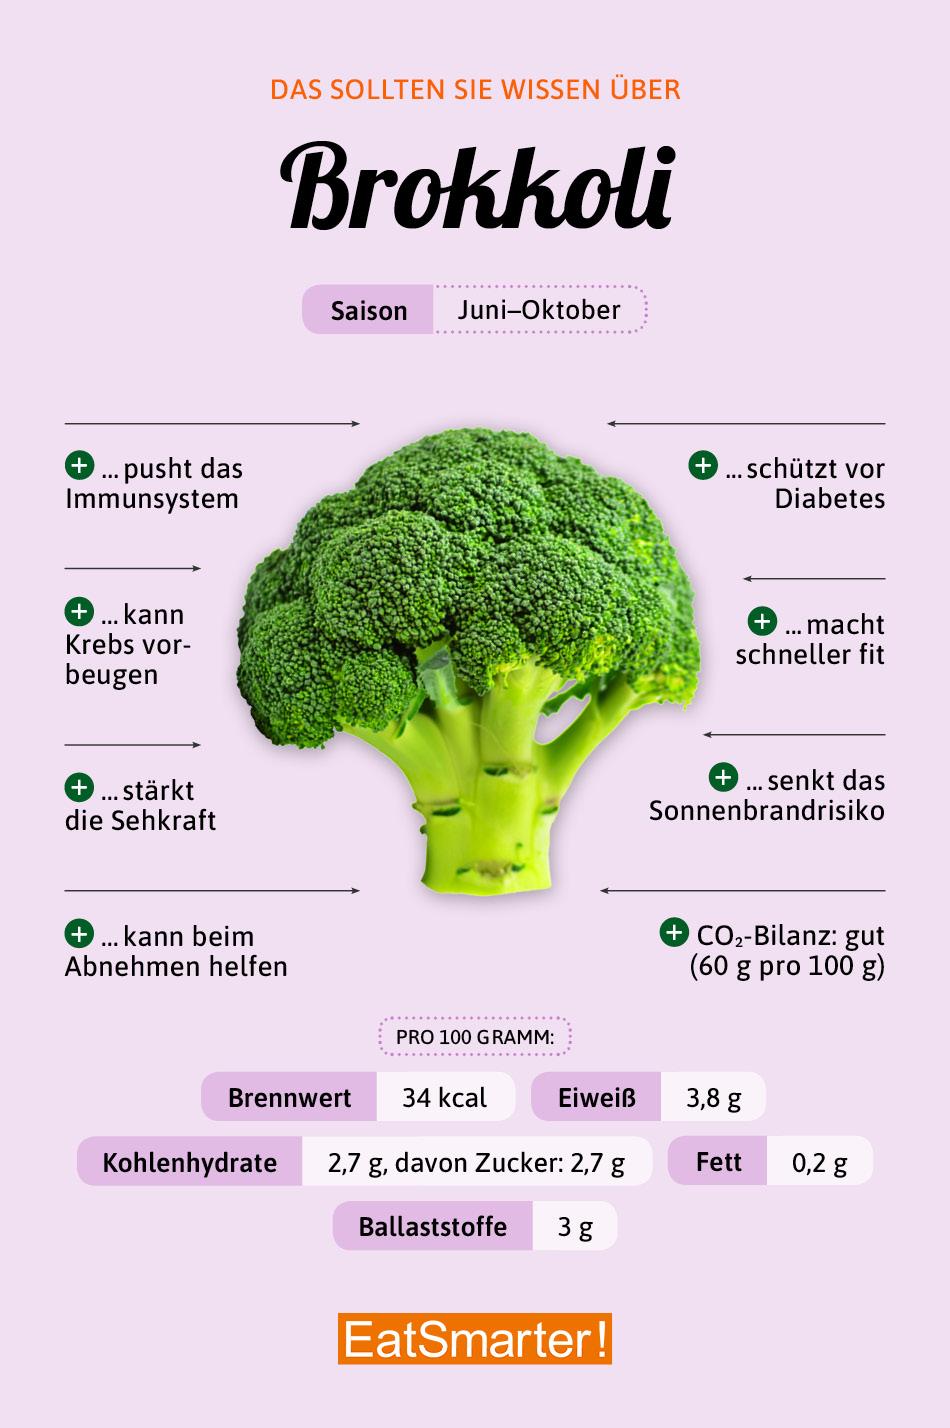 Warenkunde Brokkoli